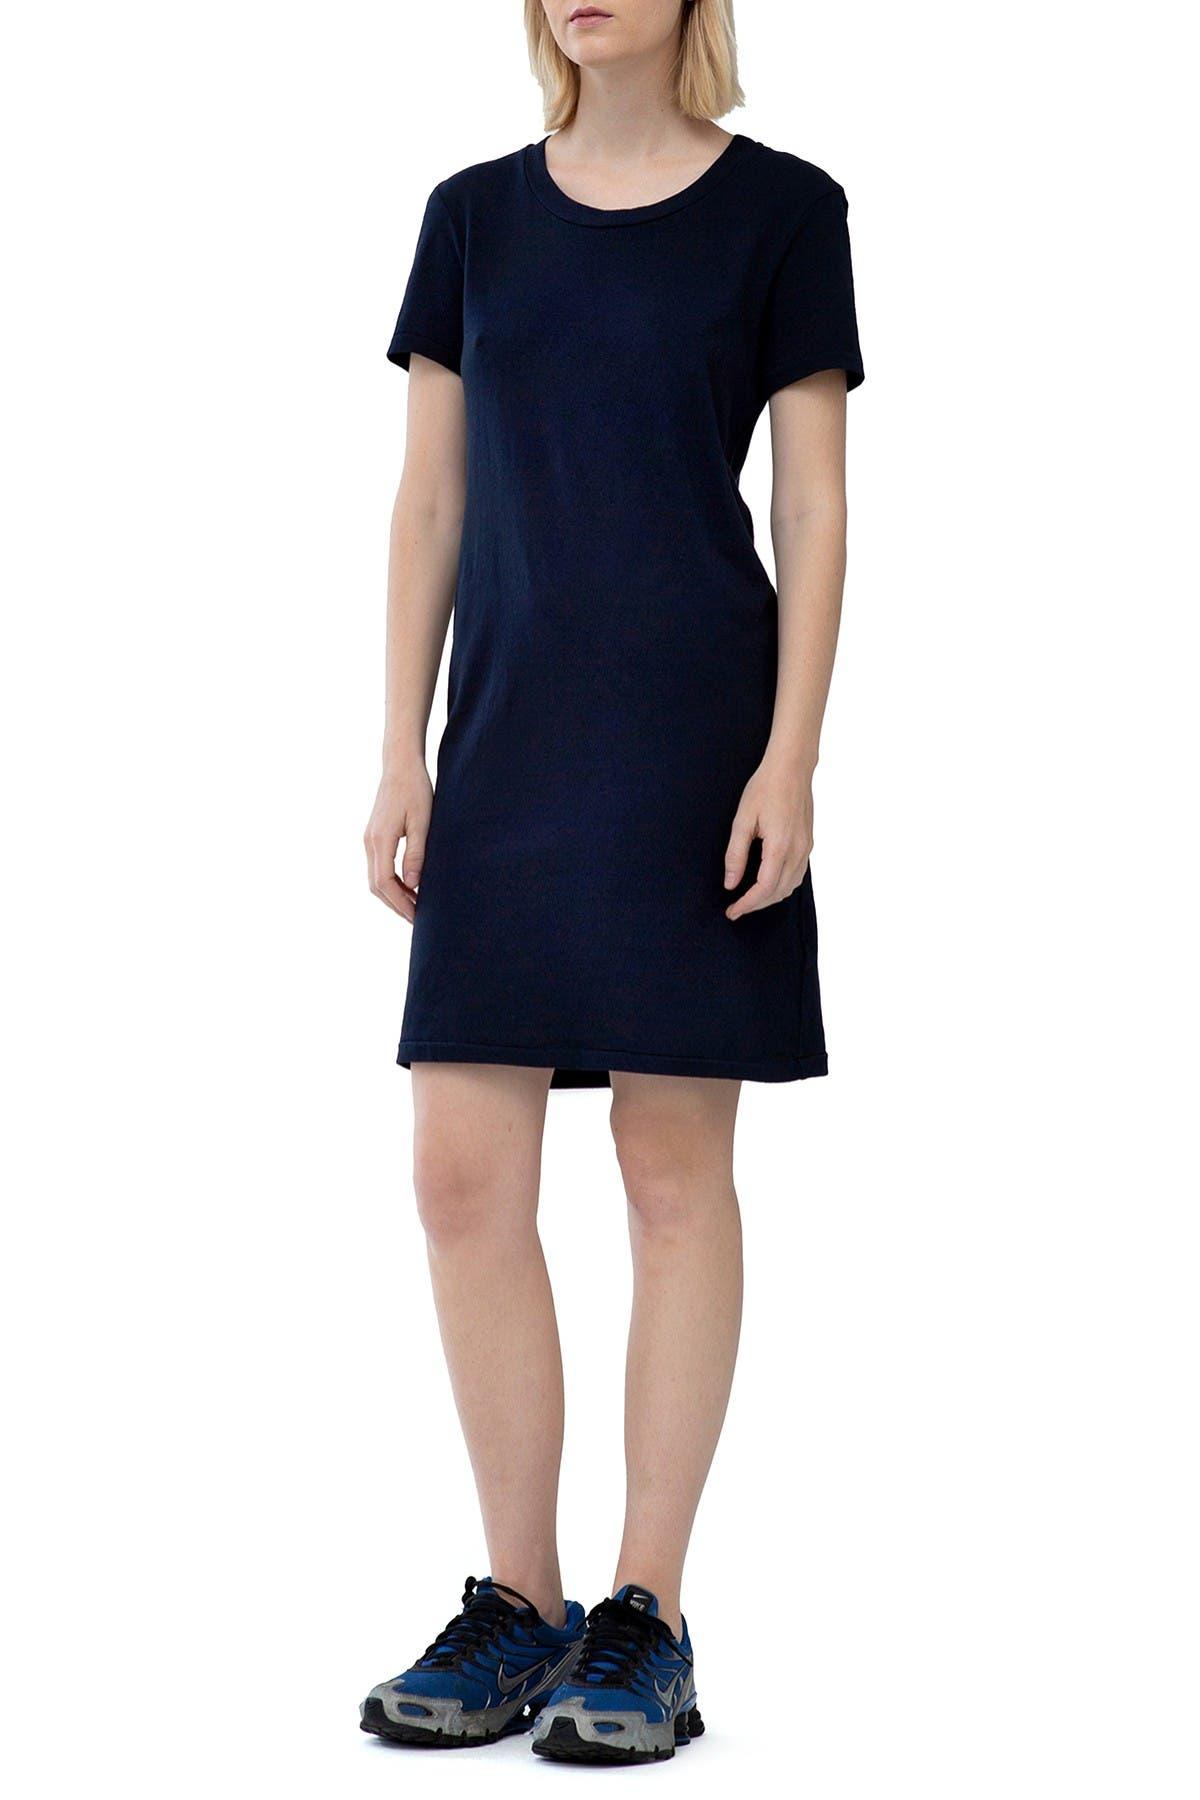 Image of Stateside Heavy Jersey Crewneck T-Shirt Dress